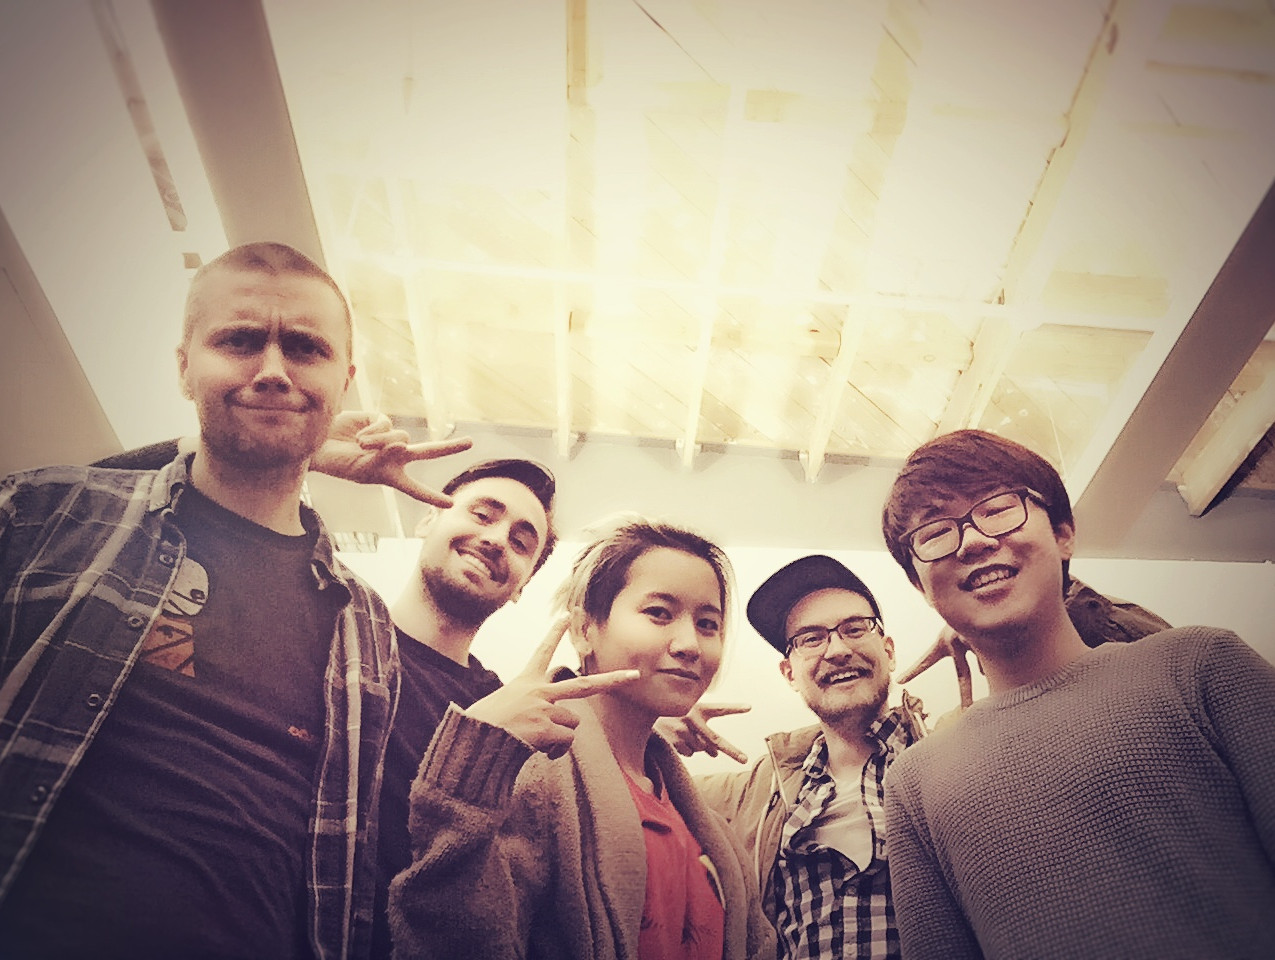 Patswitch & Comp dream team